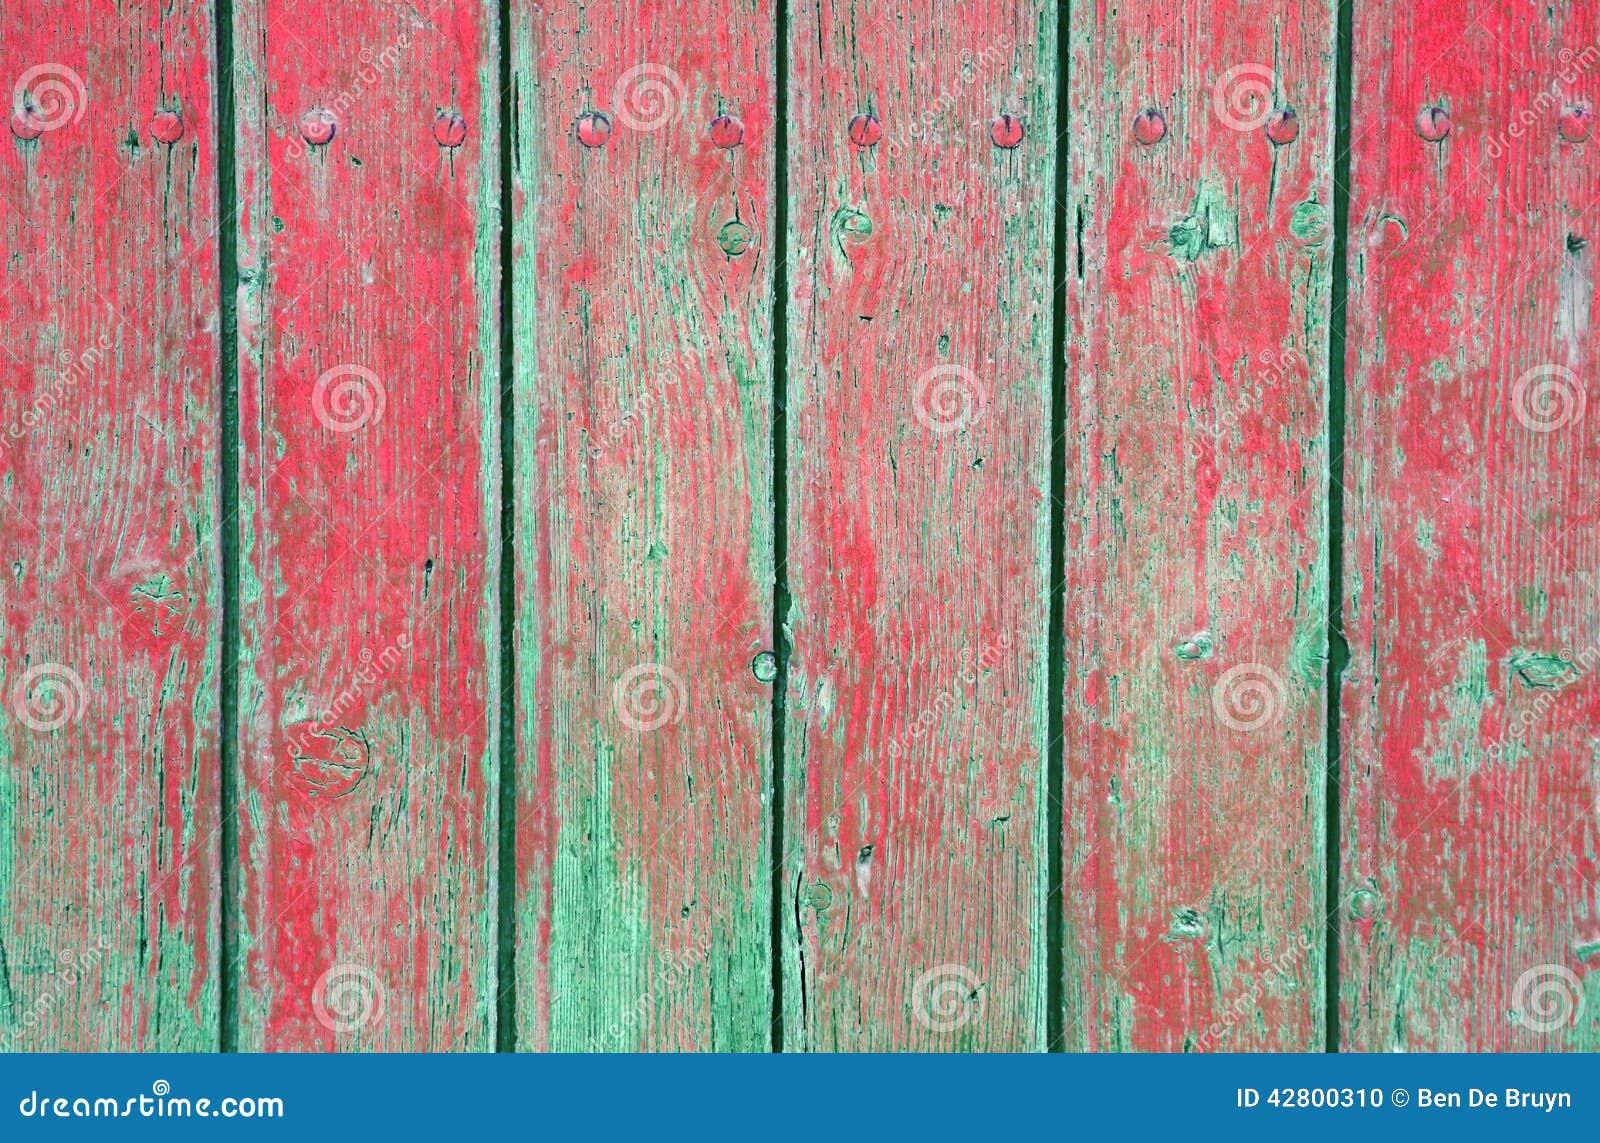 barnwood wallpaper